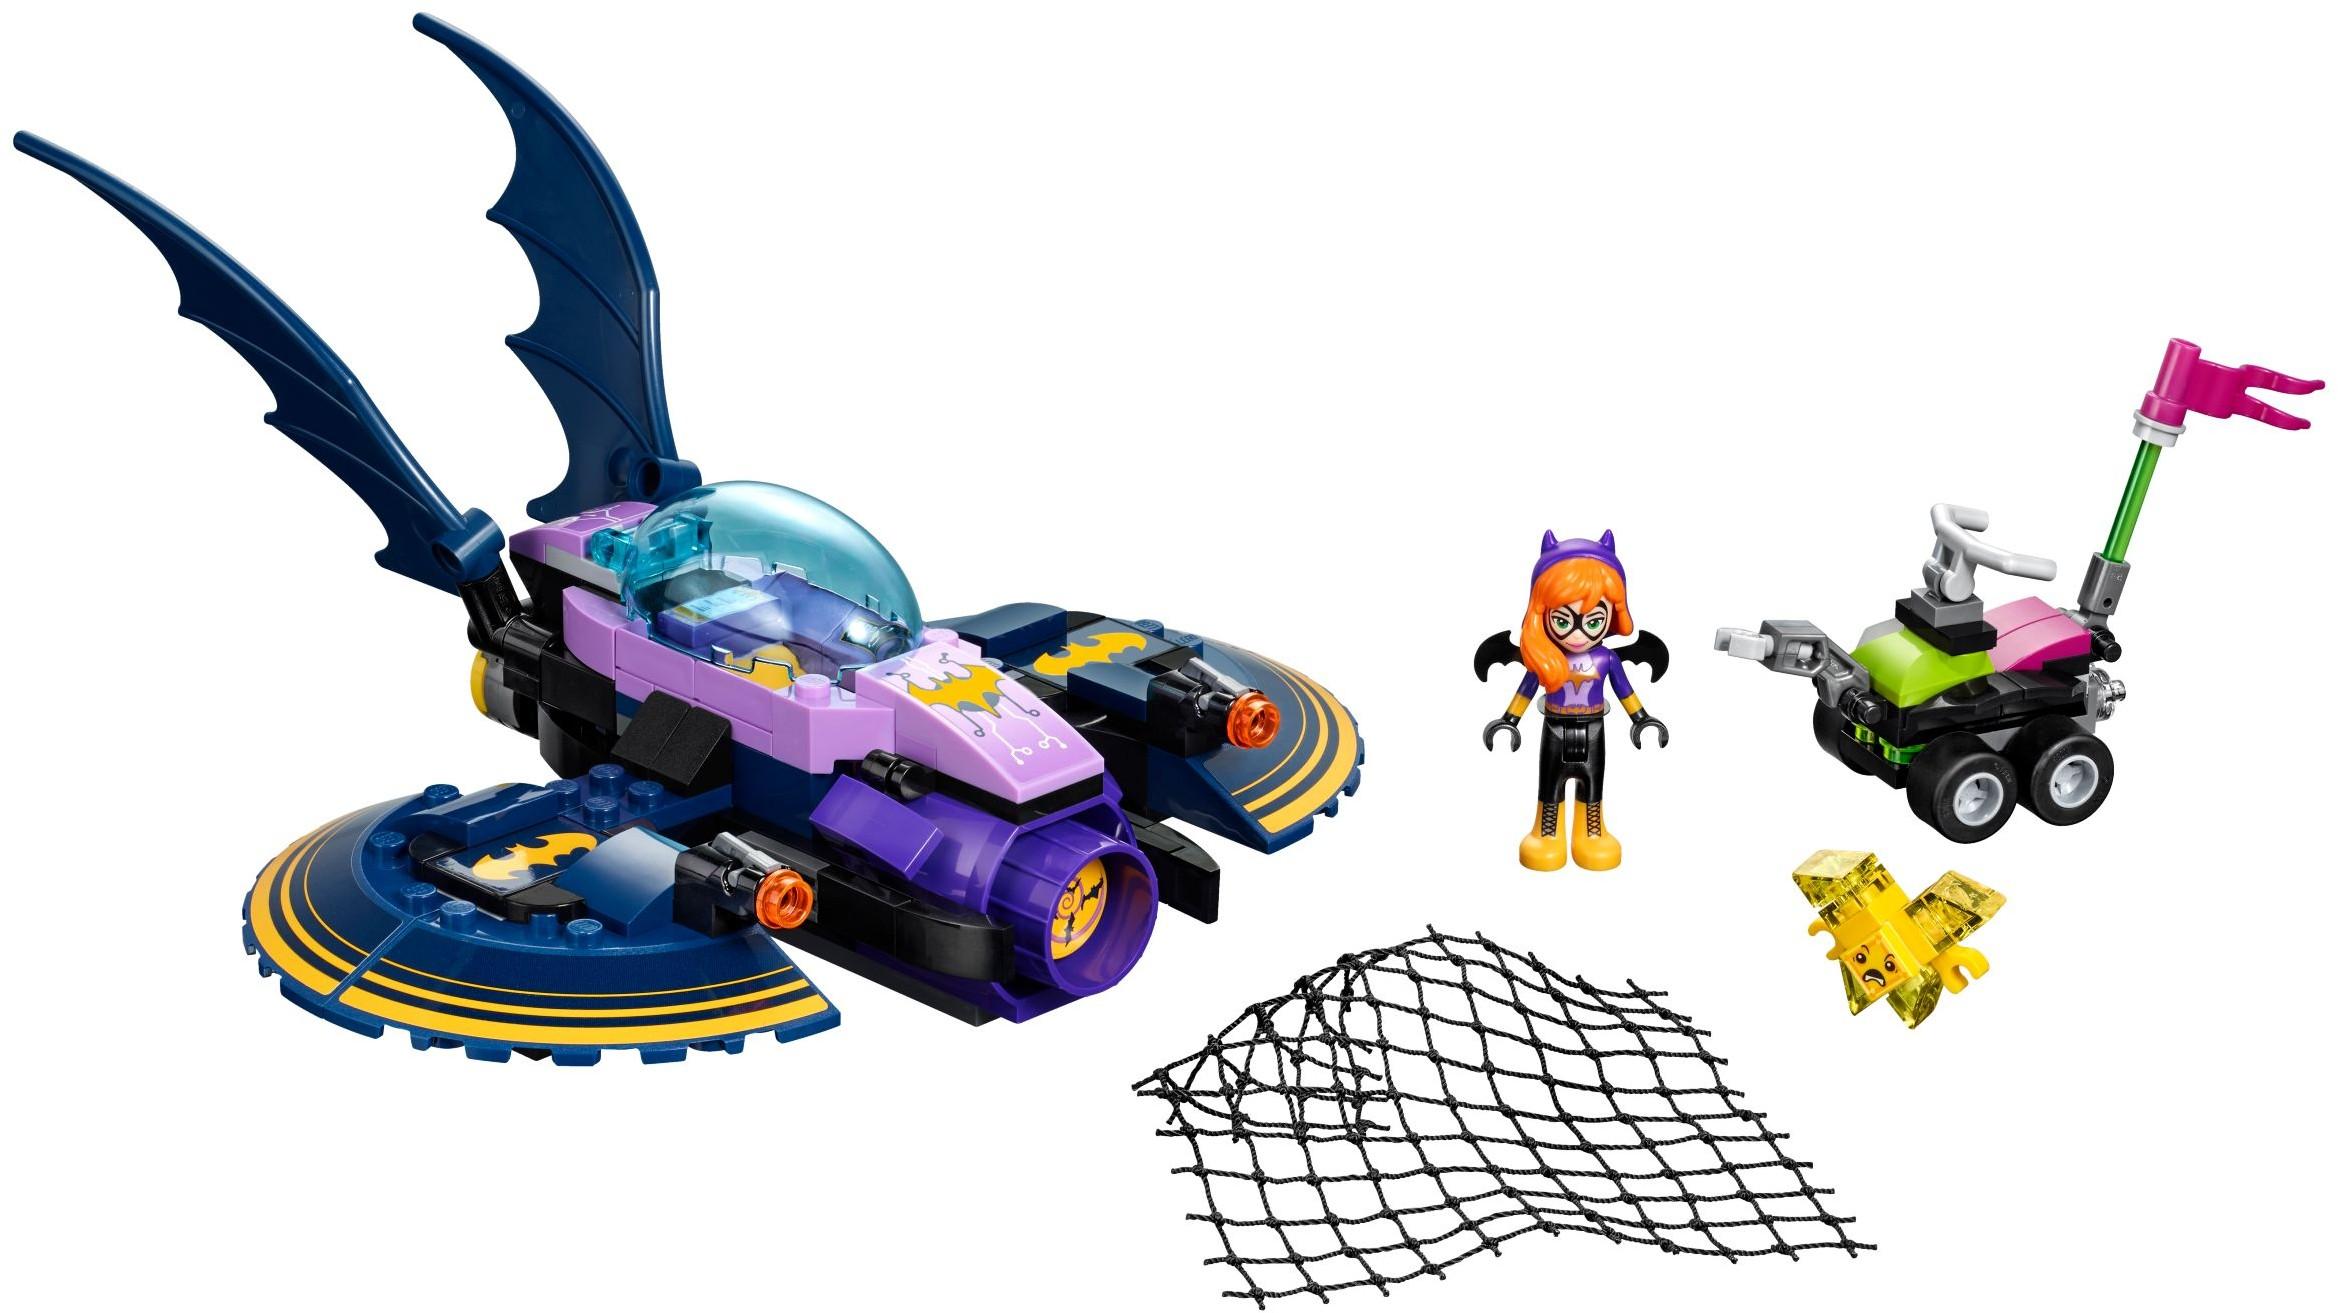 41231 LEGO DC Super Hero Girls High School Steve Trevor Minifigure